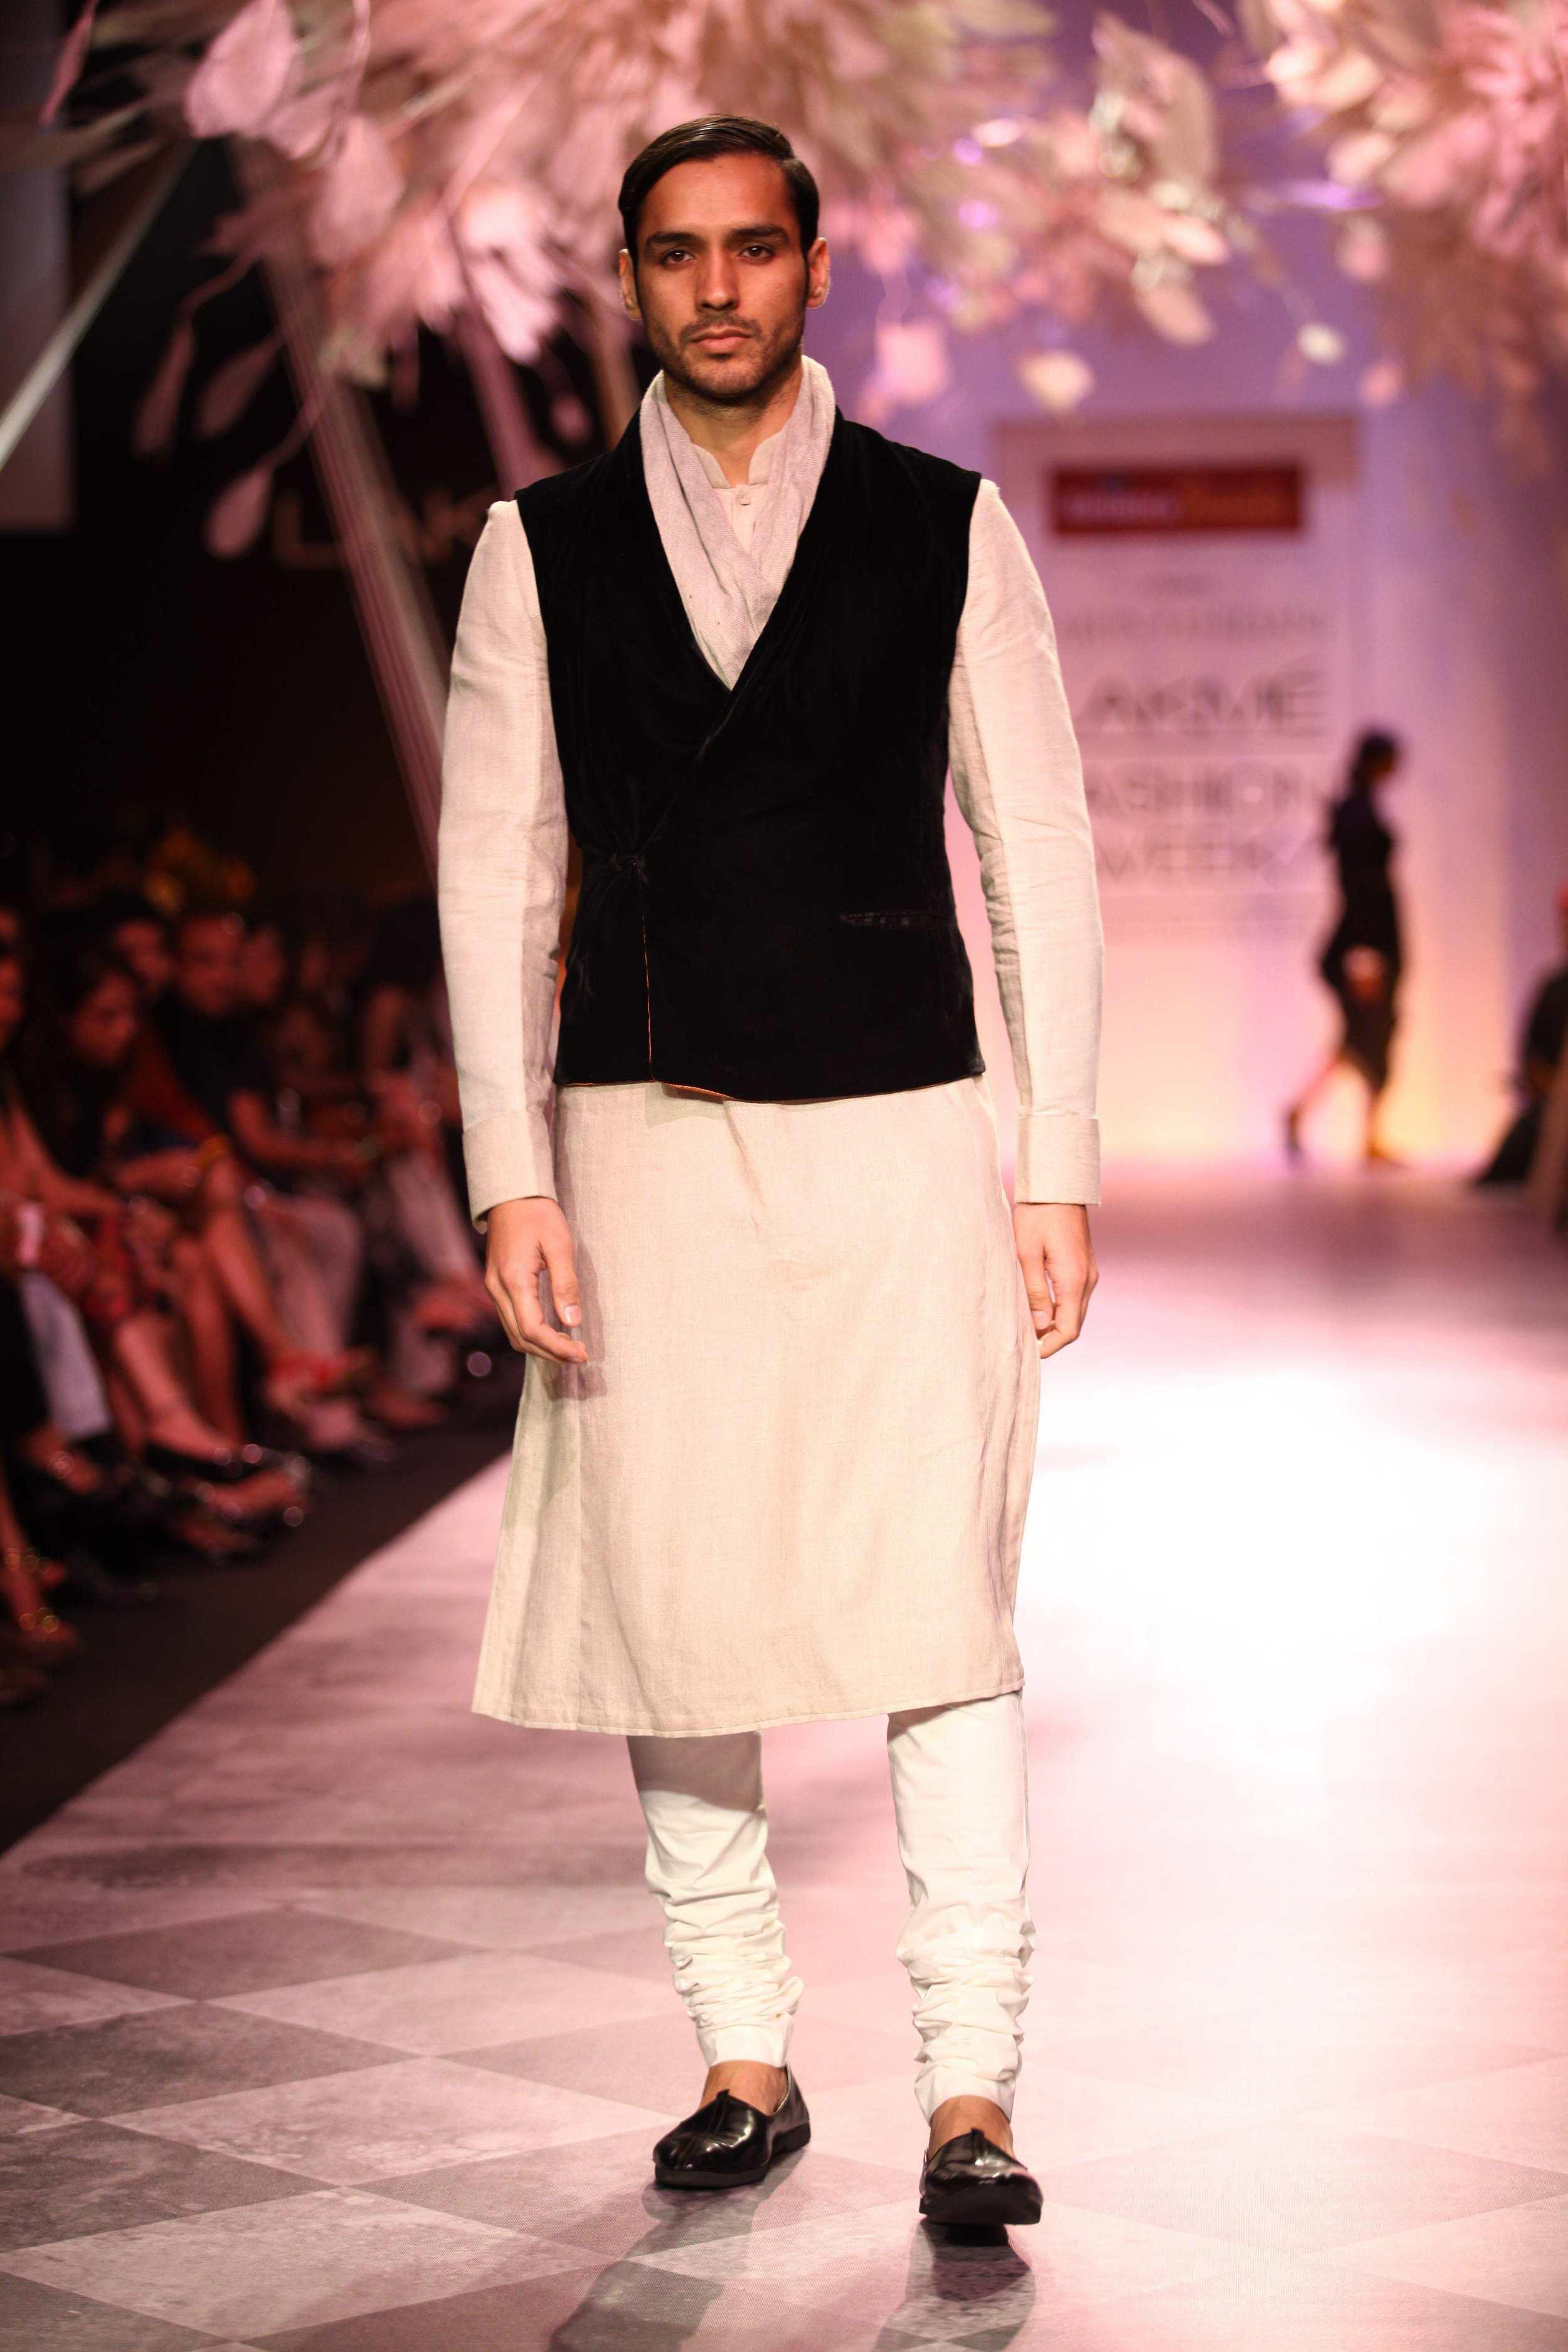 Tarun Tahiliani SS'14 Collection at LFW SR 2014 4.jpg